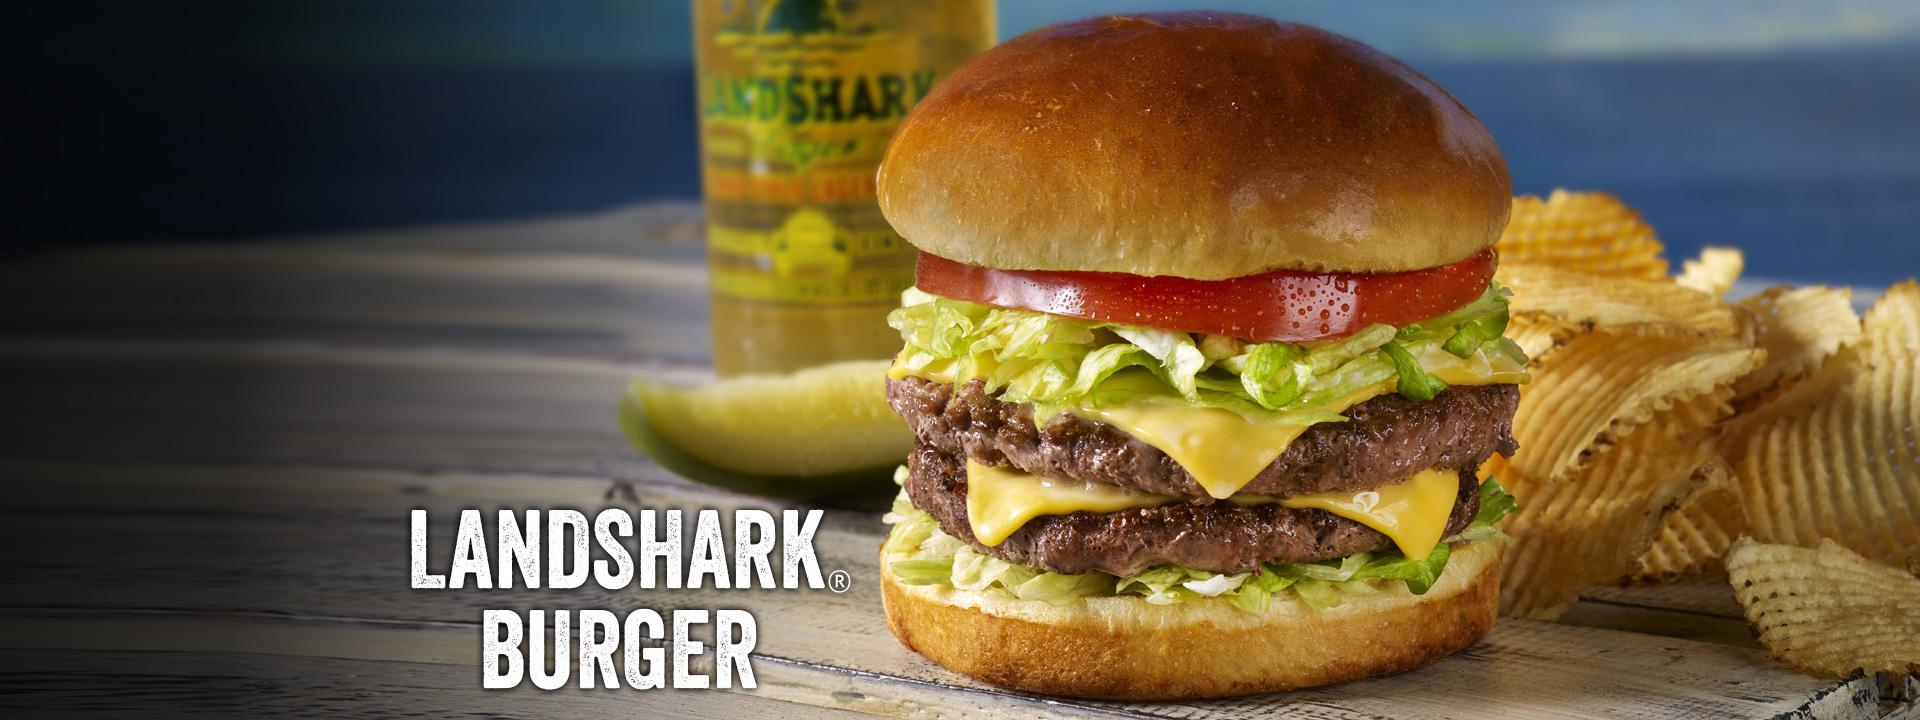 landshark_burger_18992_1502893411_19291_1505400812.jpg